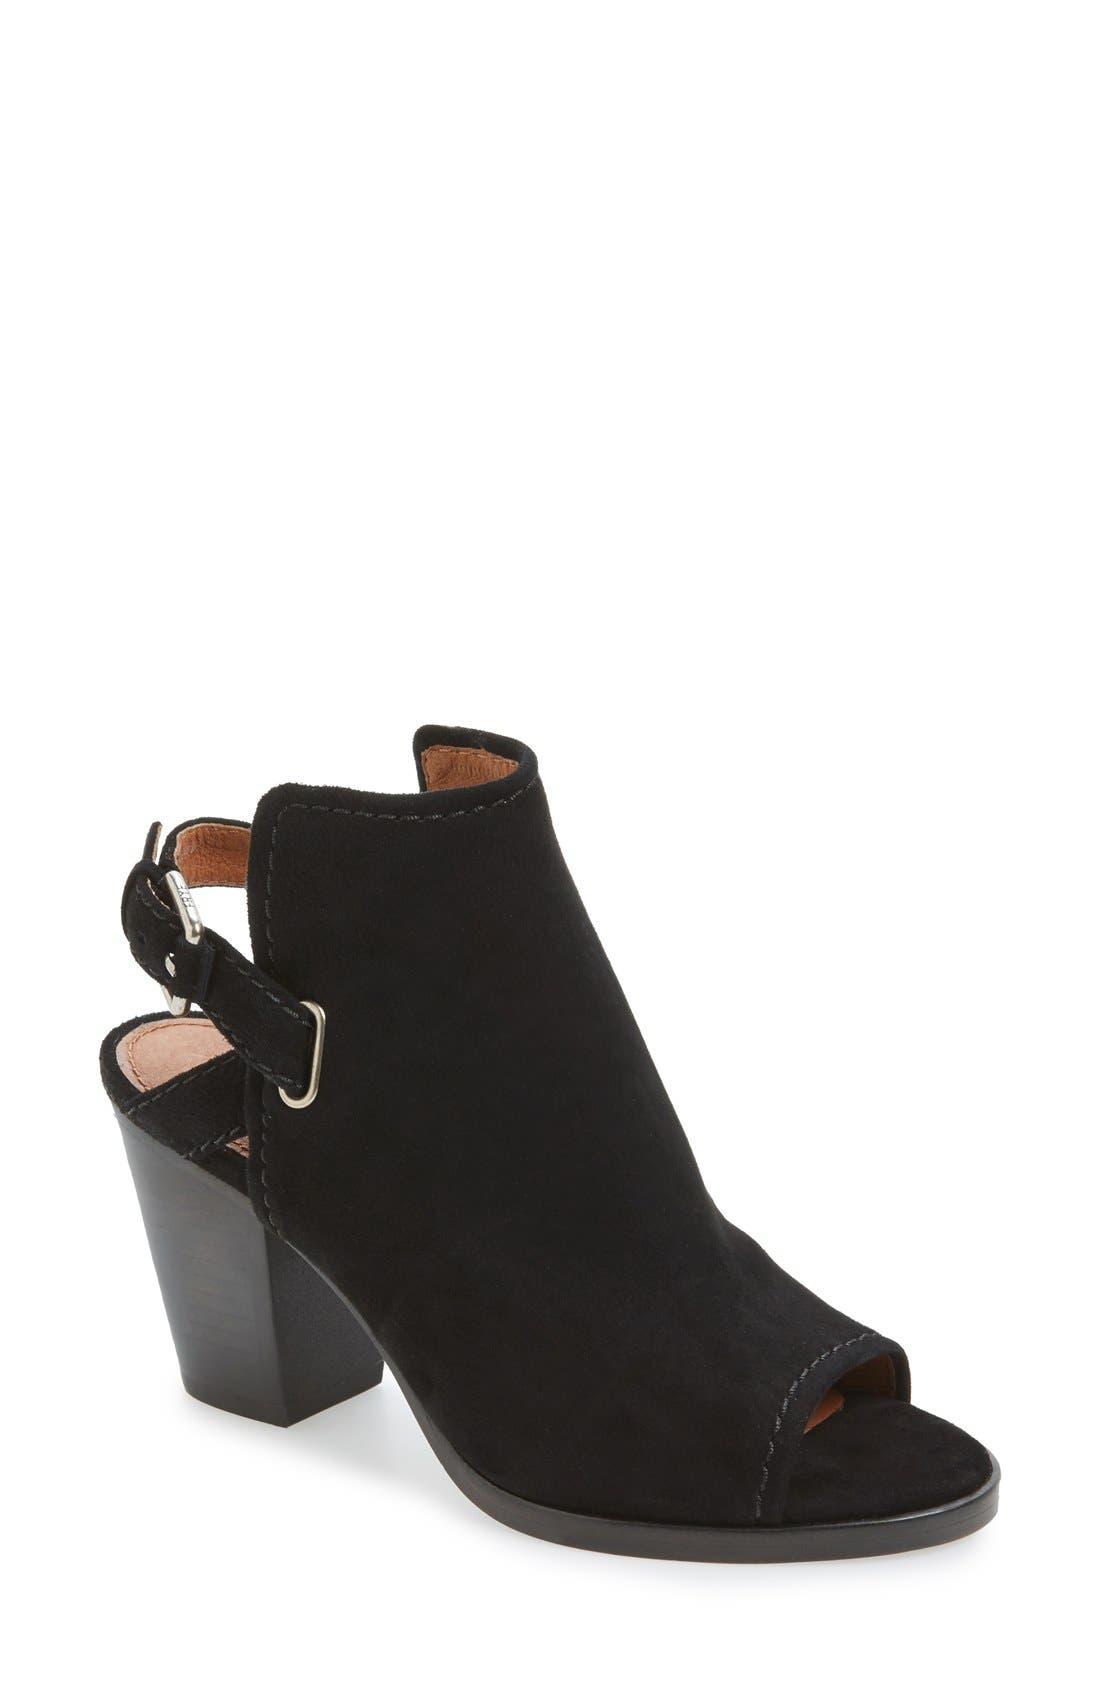 FRYE 'Dani Shield' Sandal, Main, color, 001